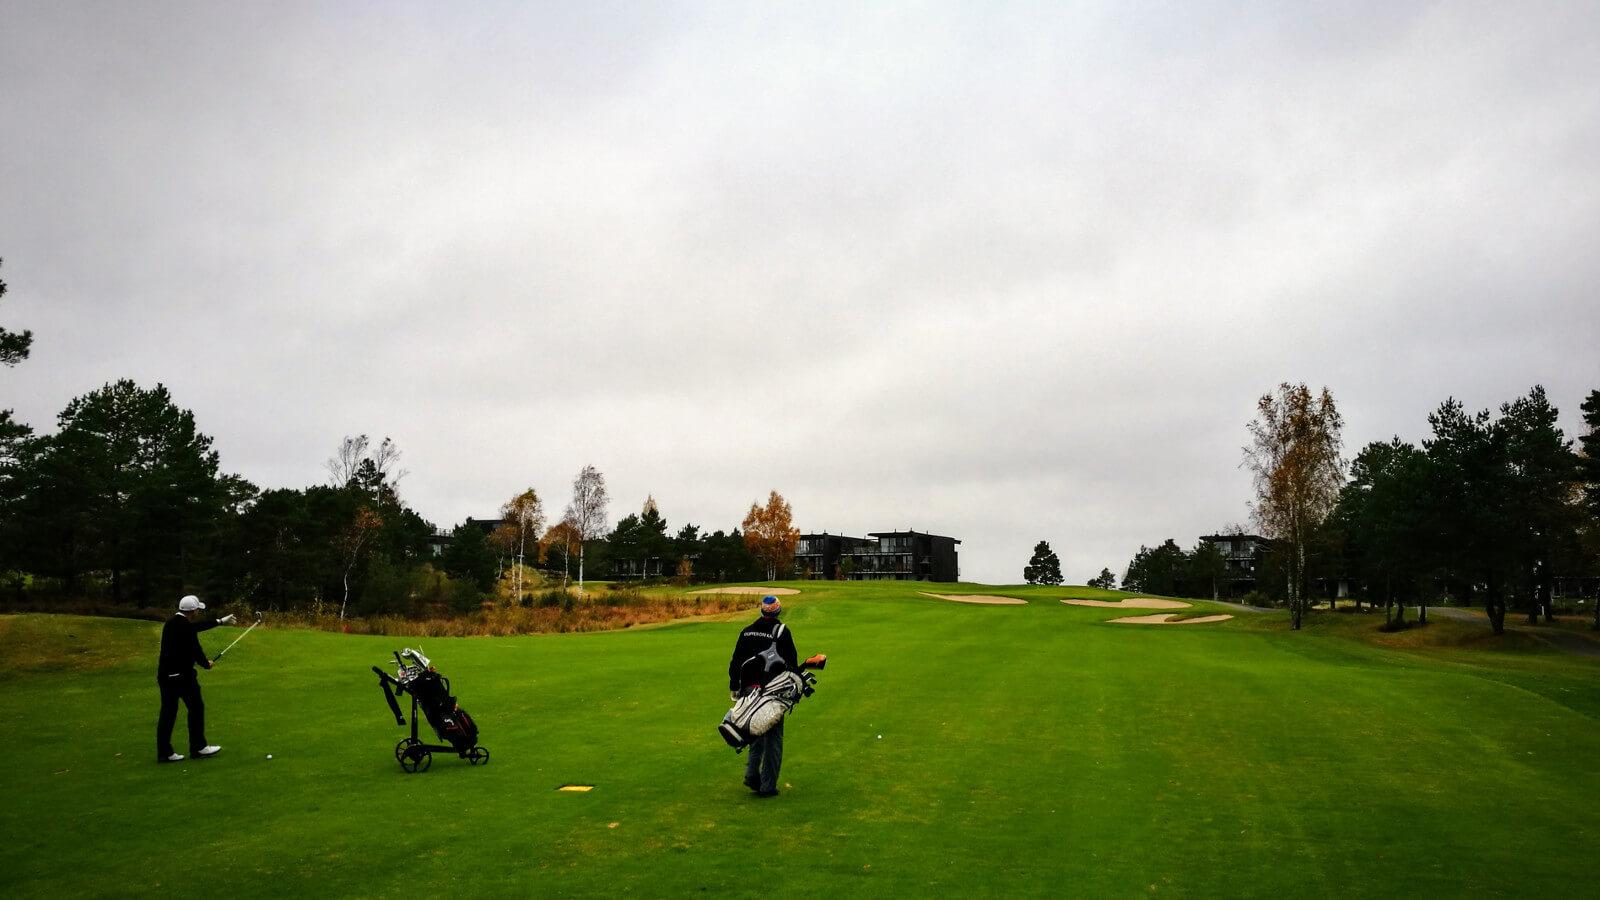 Hull 18, Kragerø Golfklubb